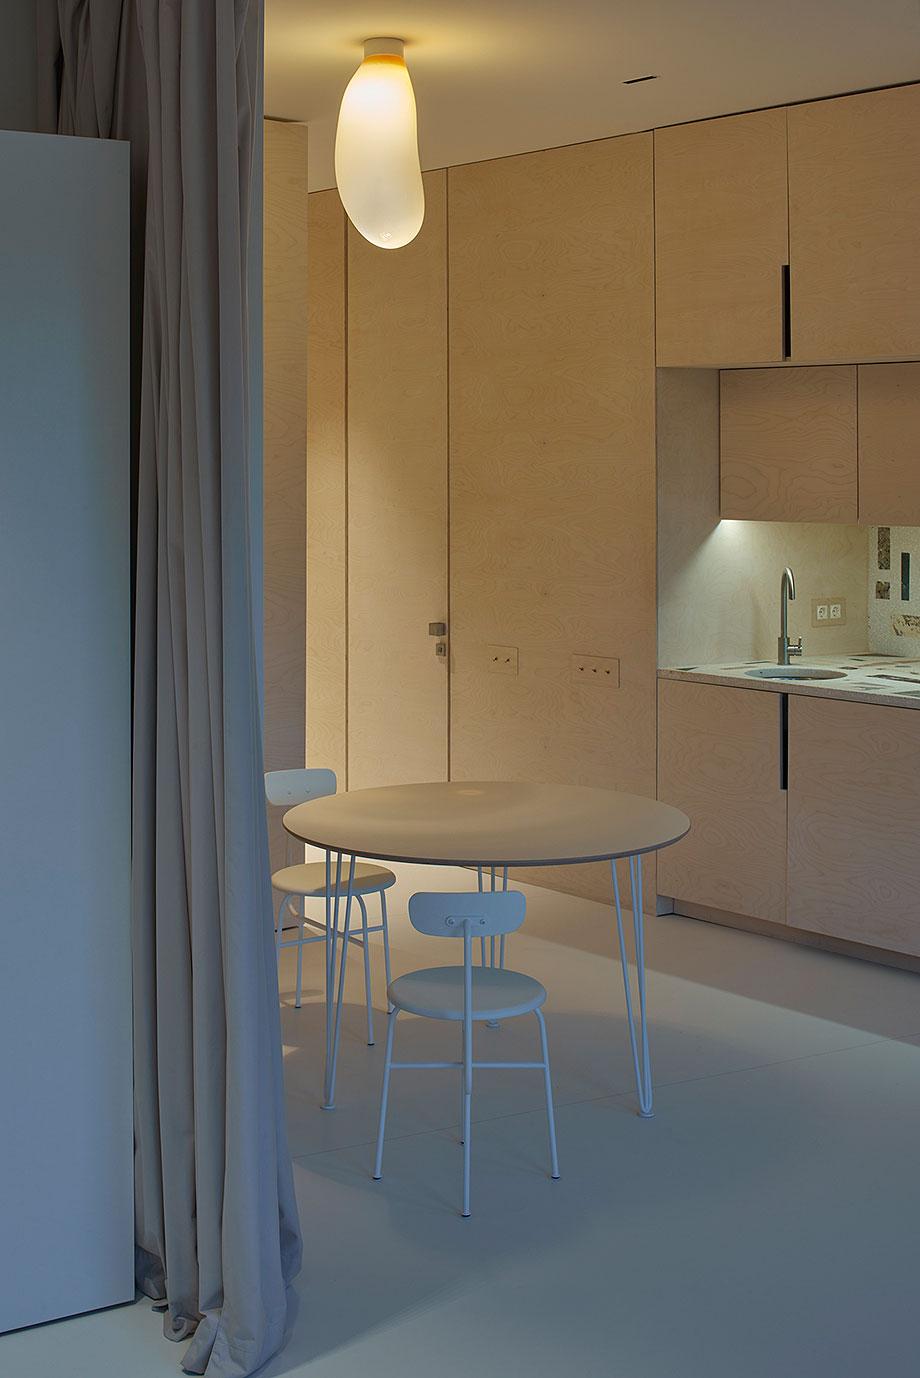 apartamento en vilna de sarkauskai architecture atelier (11) - foto darius petrulaitis